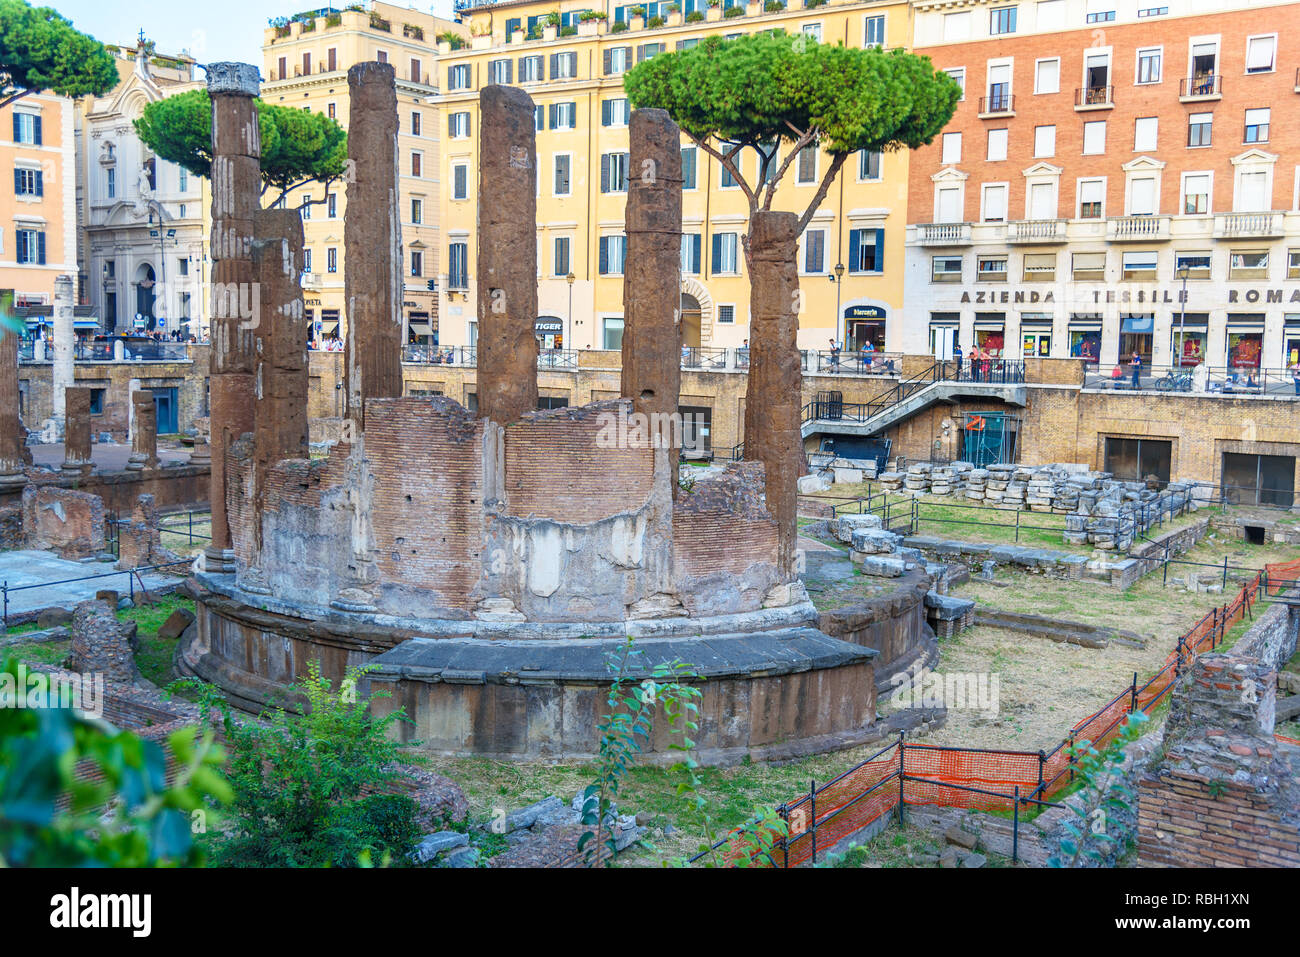 Rome, Italy - October 04, 2018: Area Sacra di Largo Argentina is square ruins in Rome - Stock Image